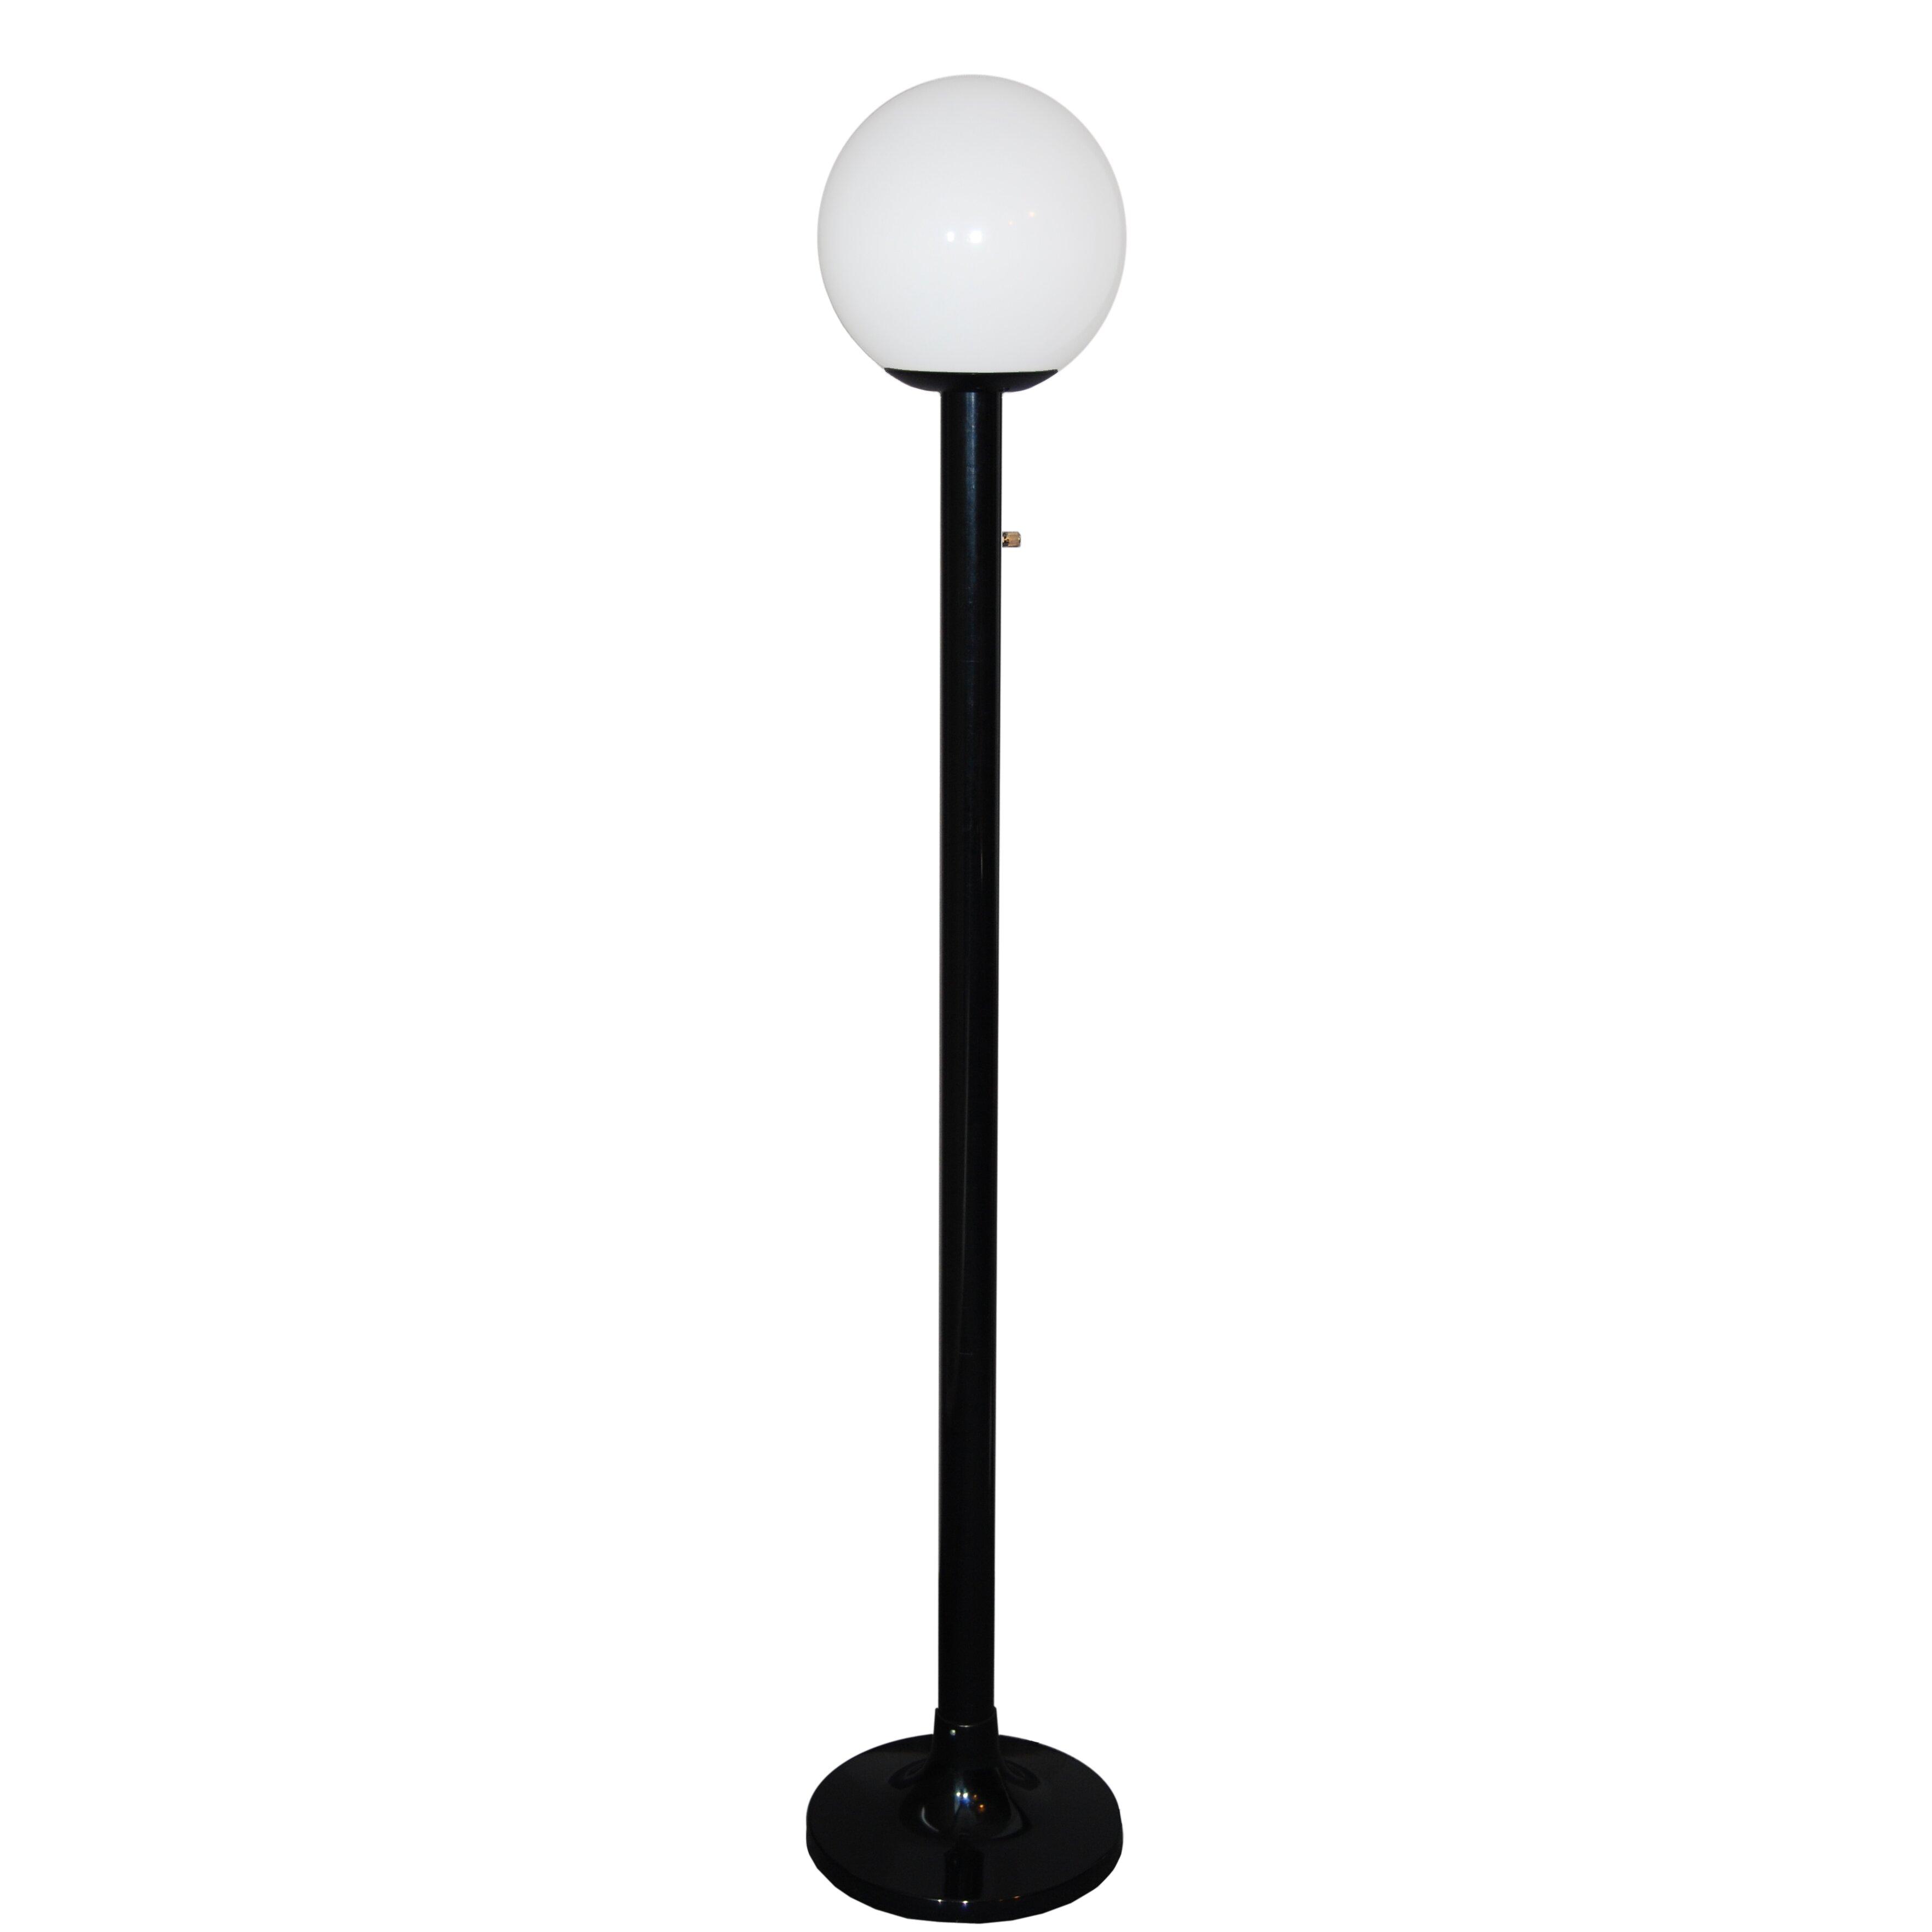 Polymerproducts single globe luminaire 79 39 39 post lantern for Globe luminaire